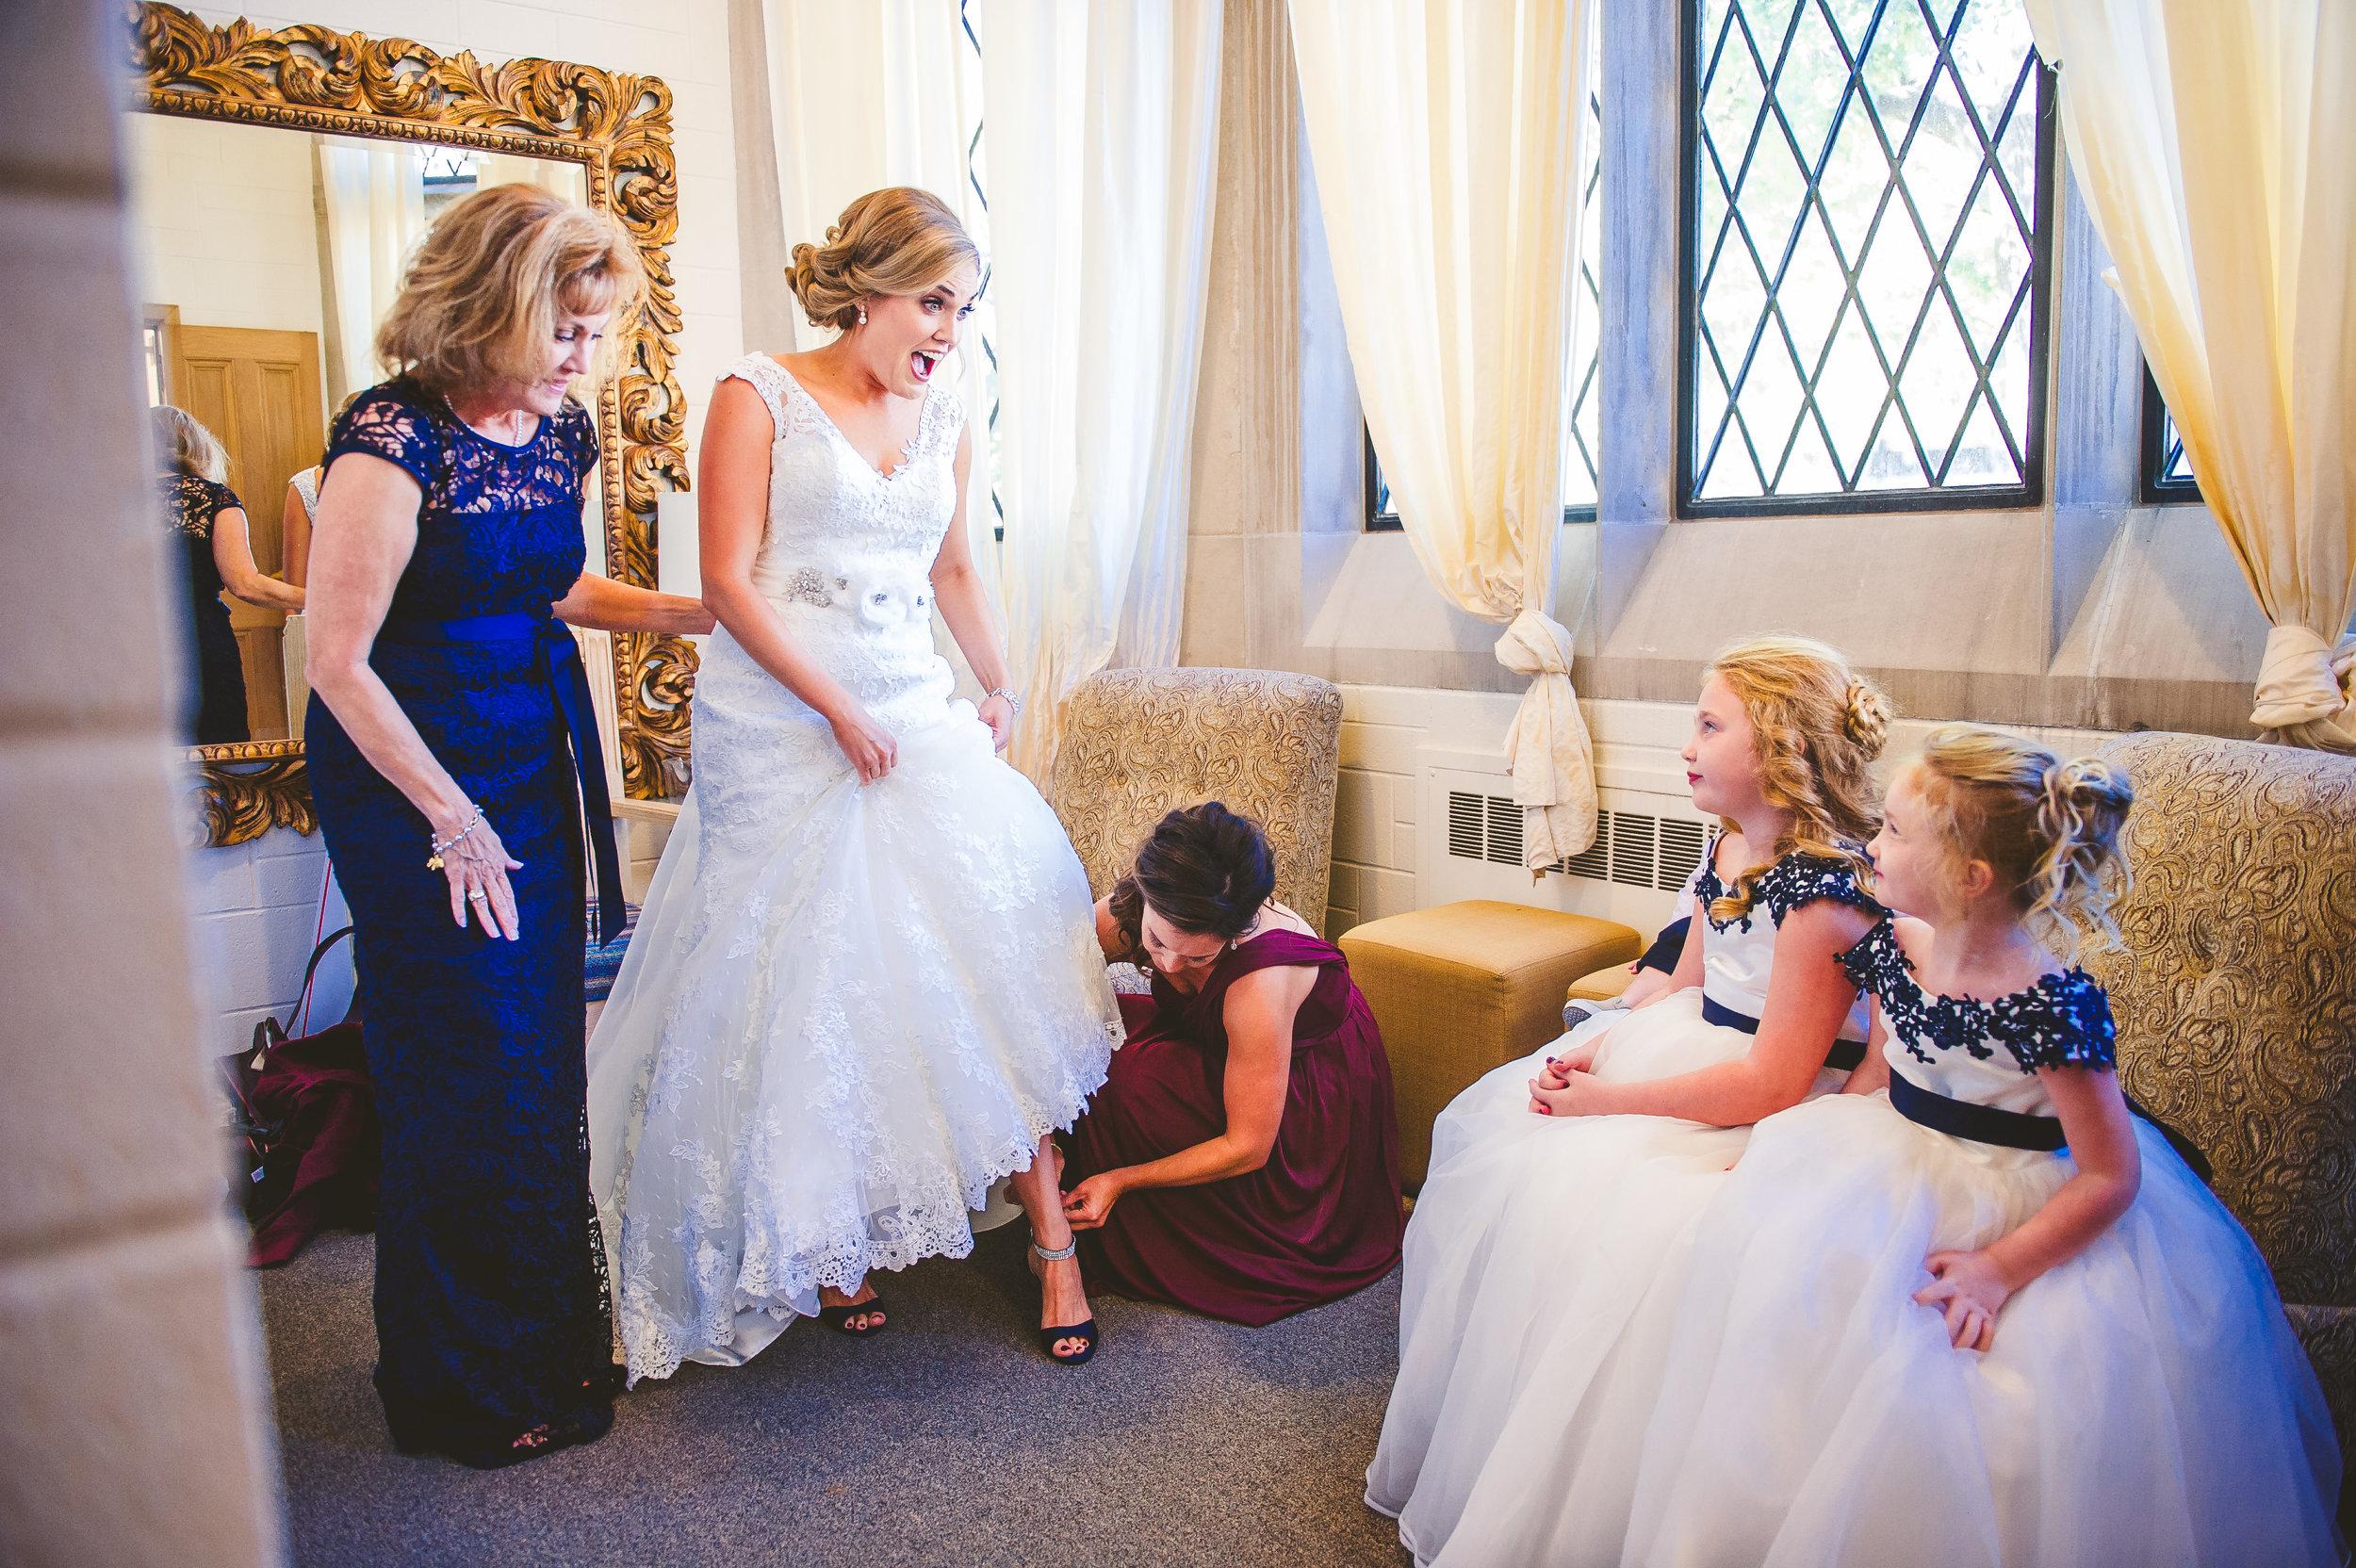 madison phil wedding_GXM_5880.jpg